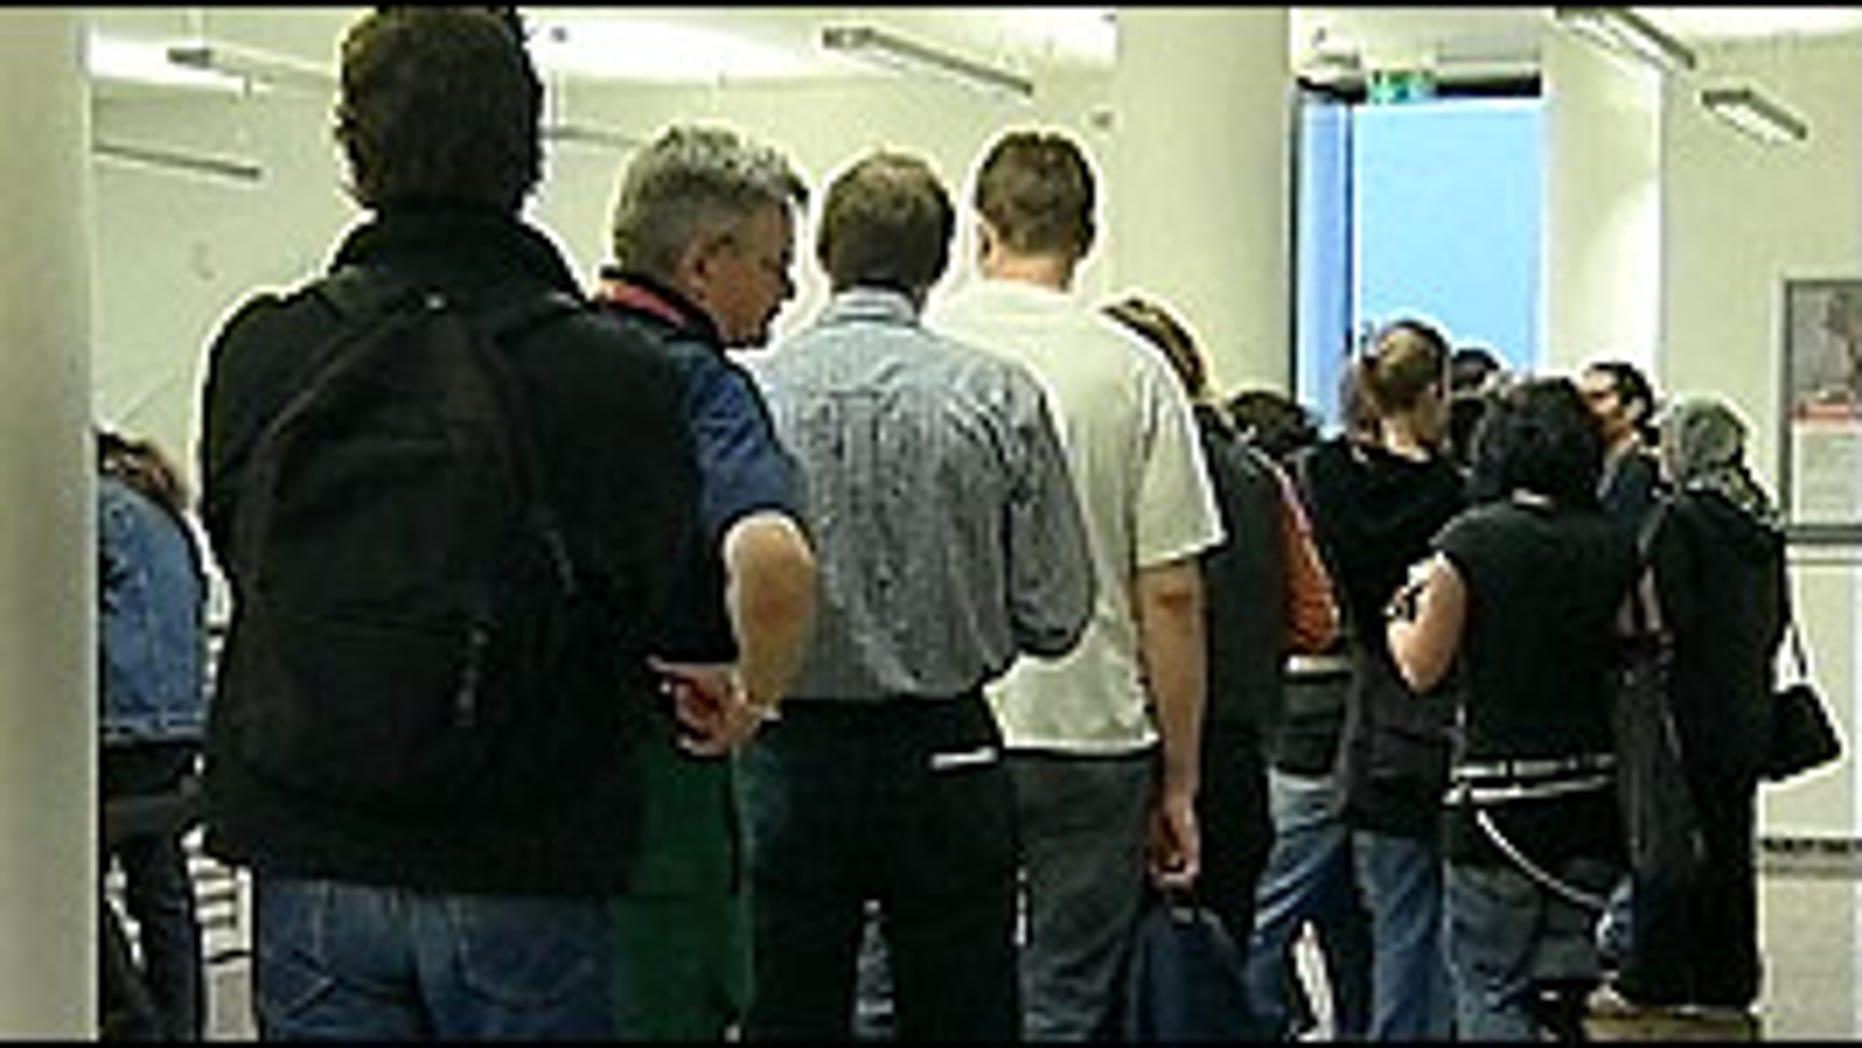 April 2011: Americans wait in line for unemployment benefits